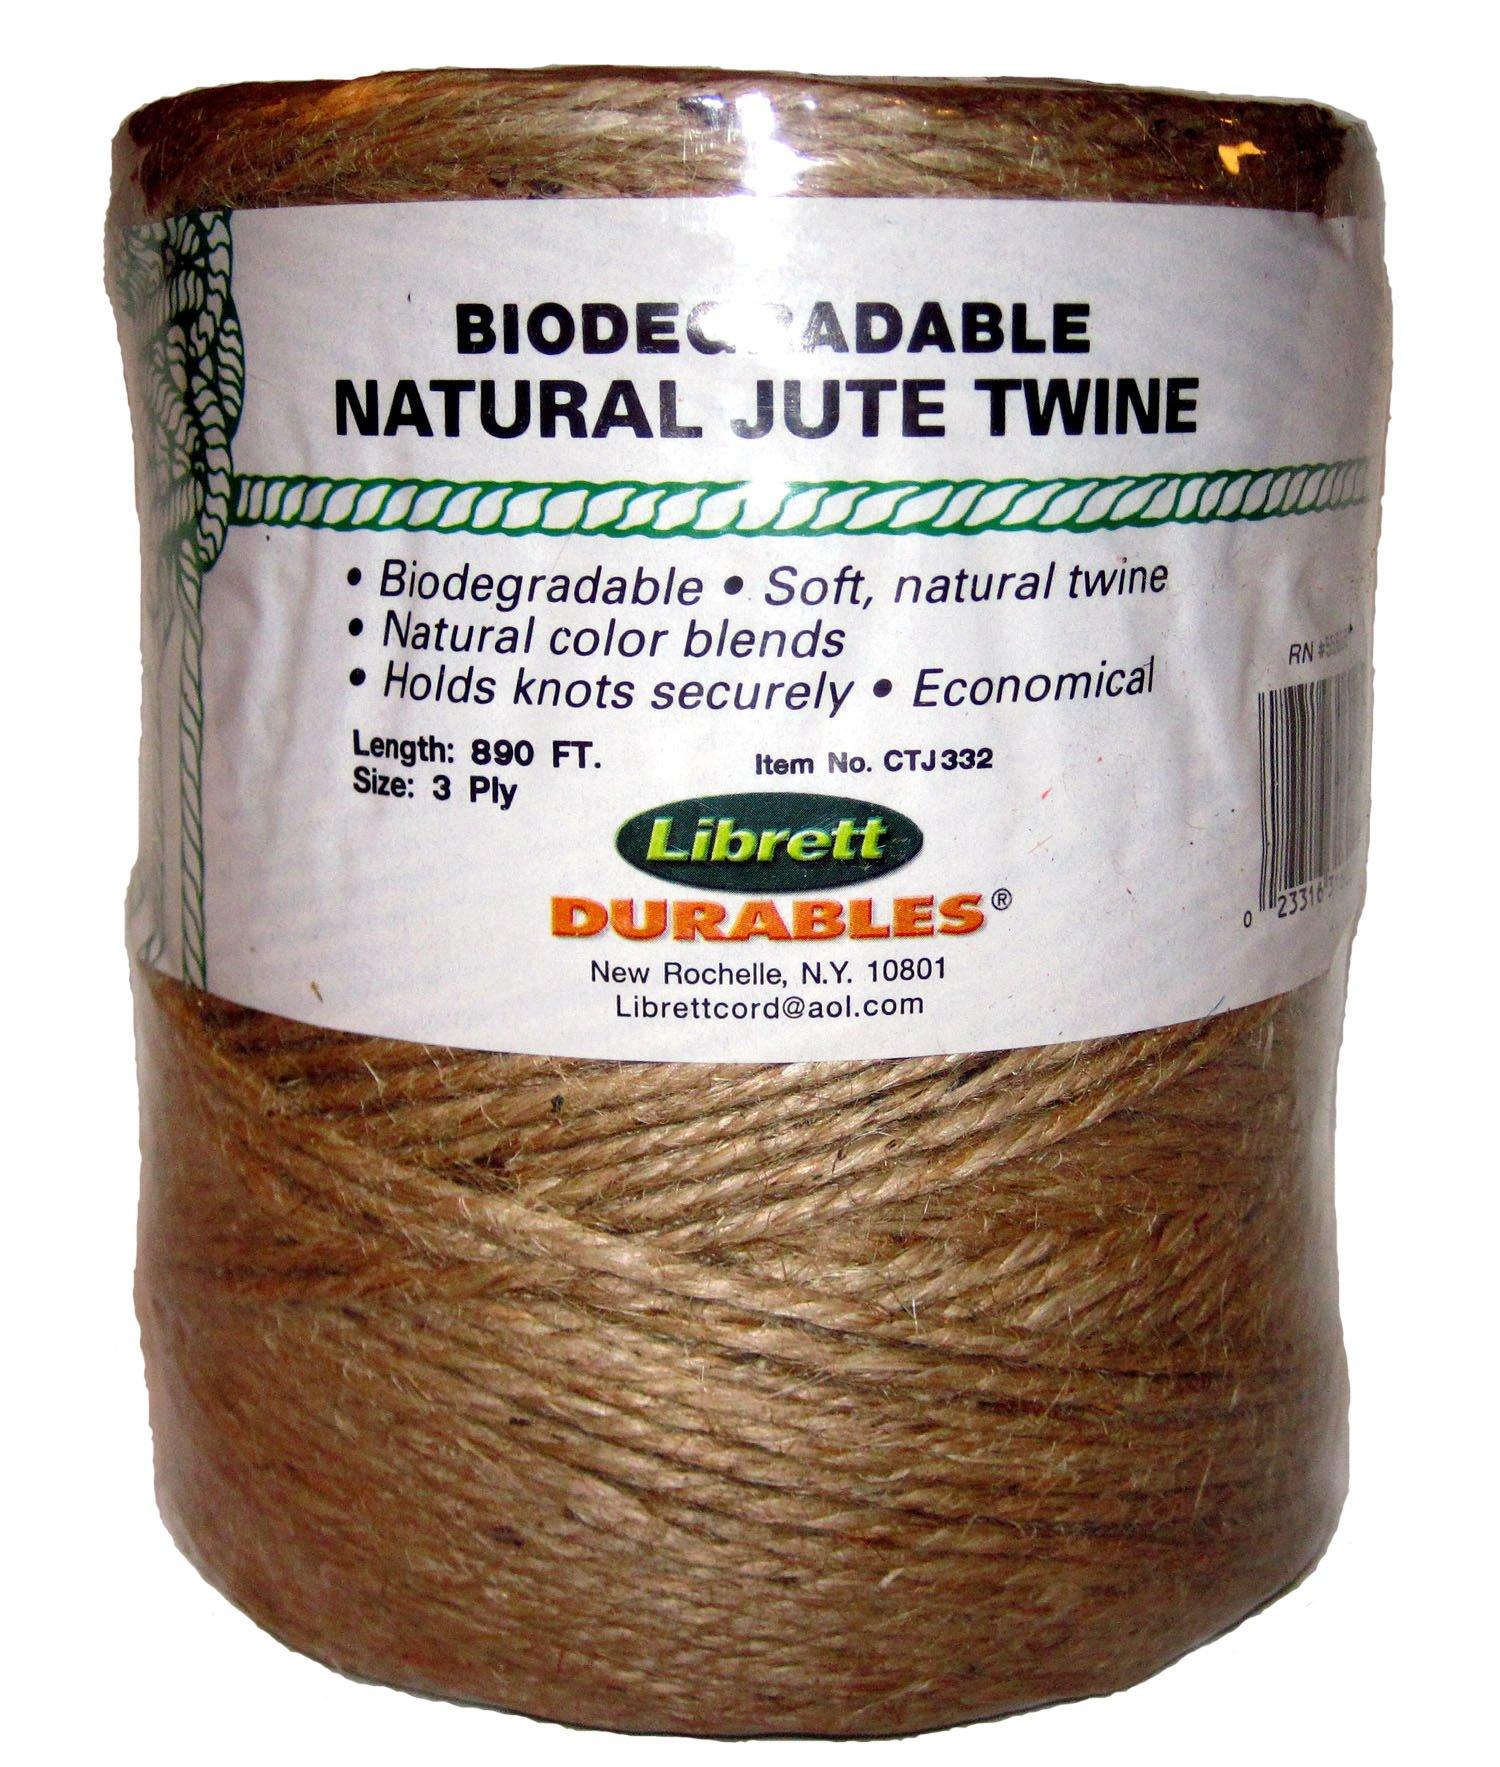 Librett Biodegradable Natural Jute Twine, 890 FT - 32oz - 3 Ply by Librett